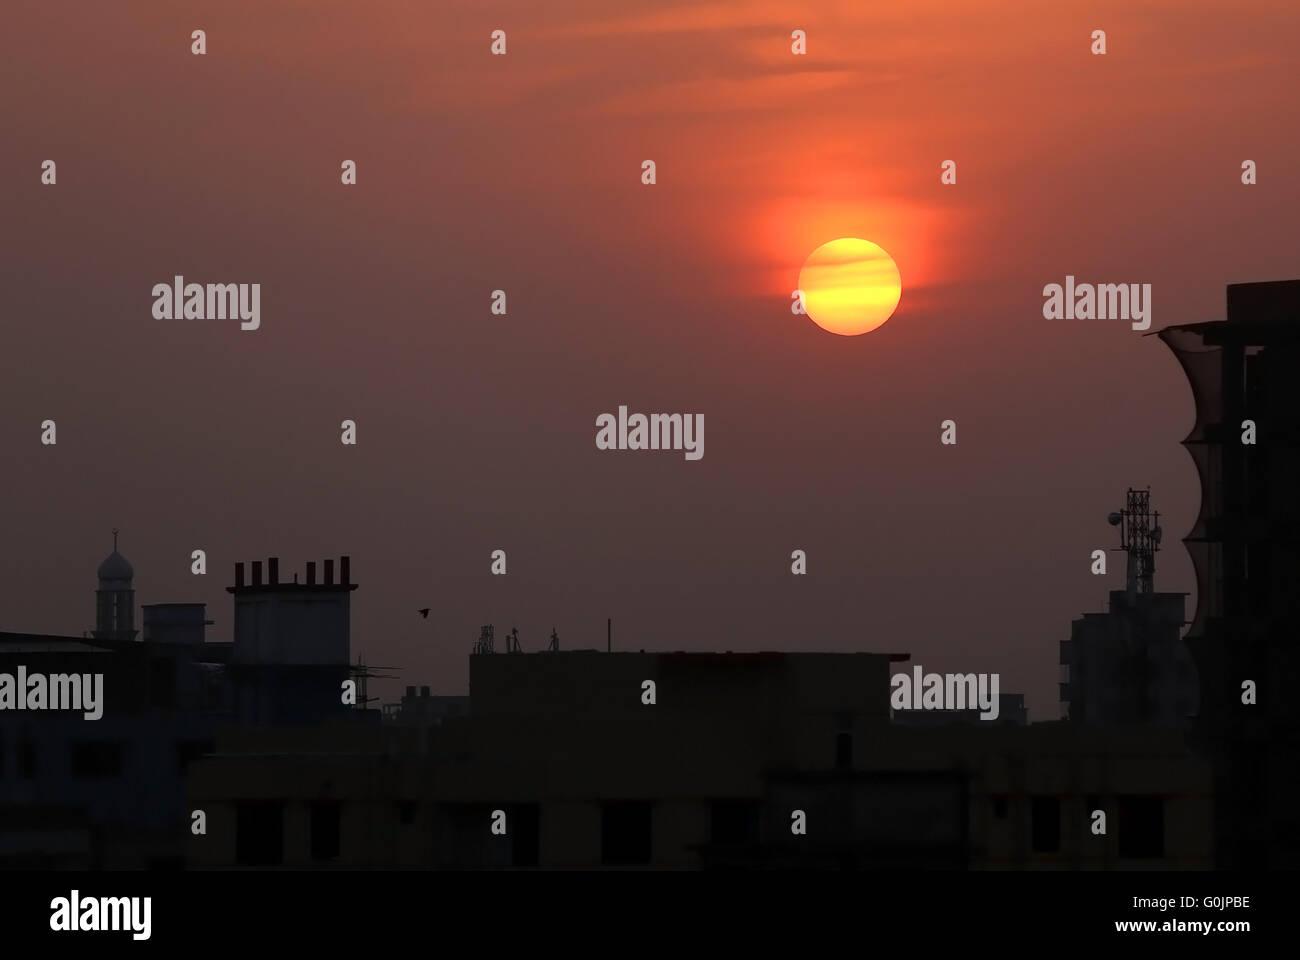 Sunset in suburban area outskirt of Dhaka Bangladesh - Stock Image